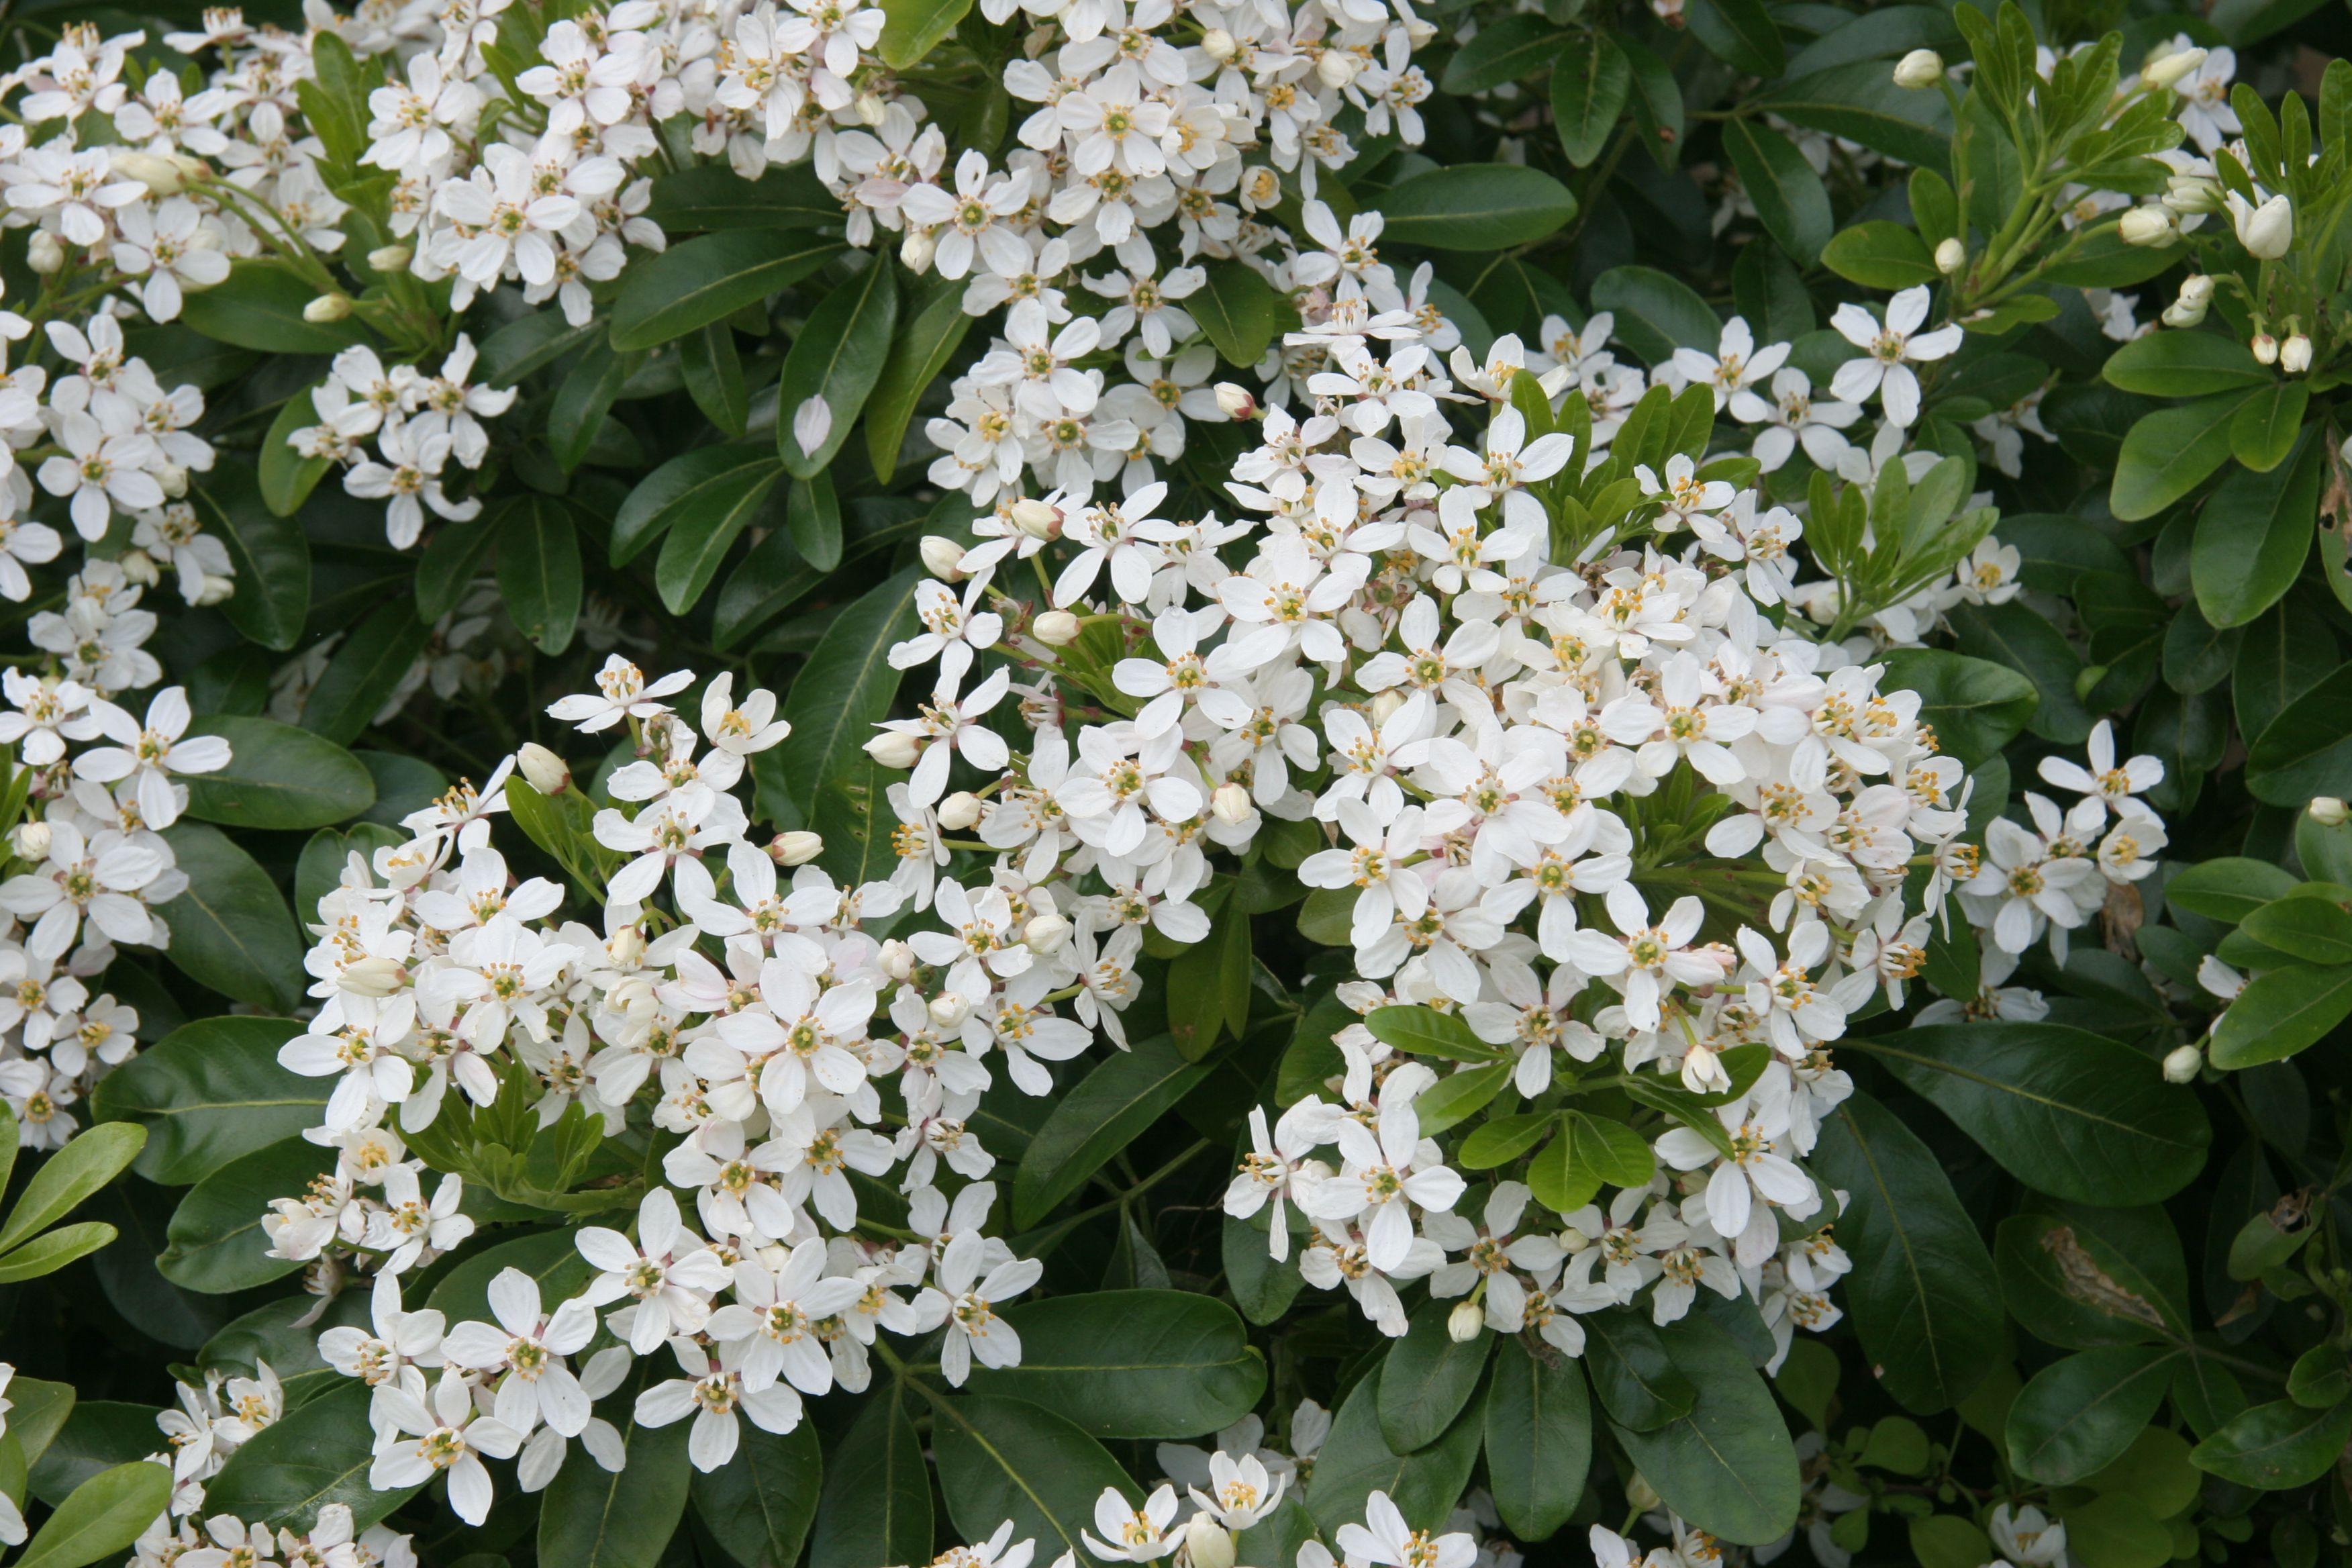 choisya ternata oranger du mexique fleurs blanches tr s. Black Bedroom Furniture Sets. Home Design Ideas